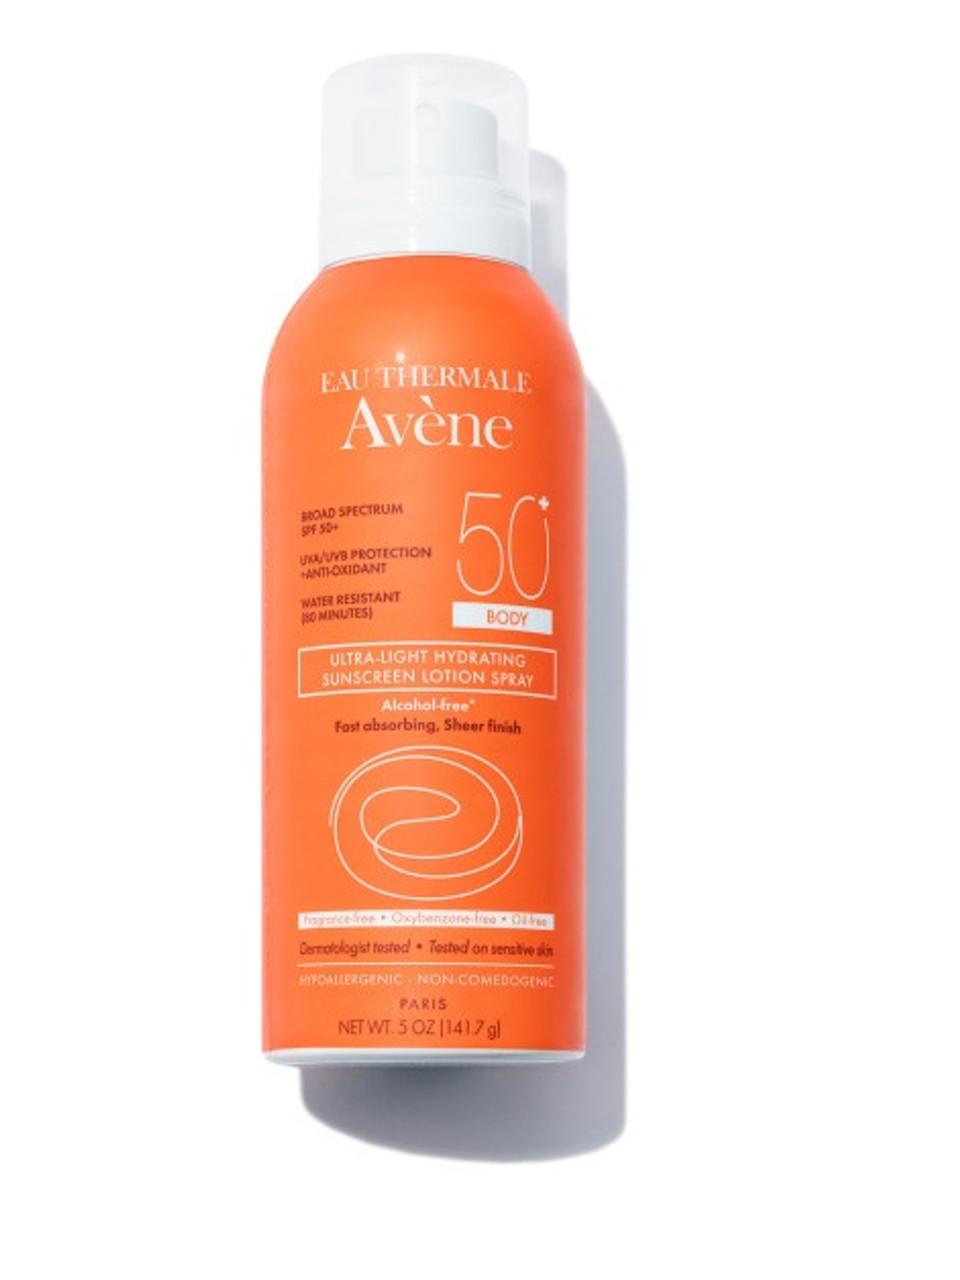 0d3603c47682 Avene Ultra-Light Hydrating Sunscreen Lotion Spray SPF 50+ Body -  beautystoredepot.com